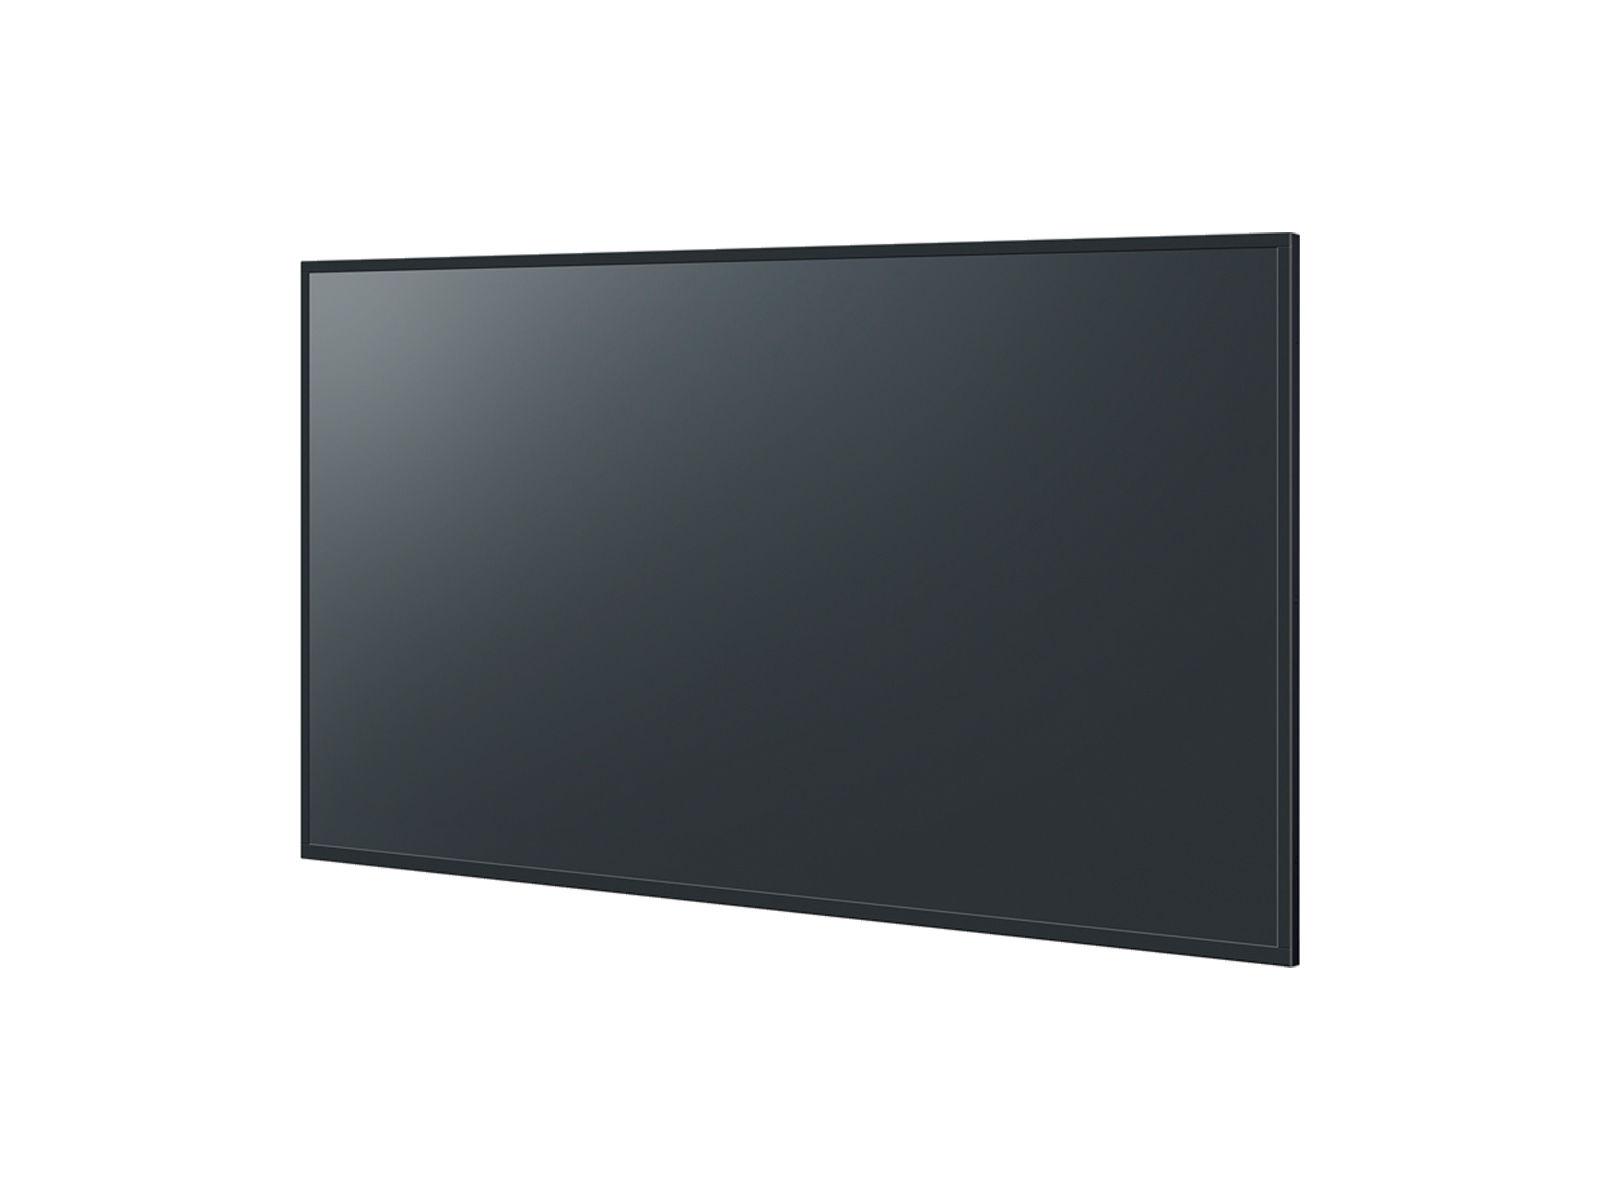 "Panasonic TH-98SQ1-IR | 98"" 248 cm, UHD LCD-Display, LED, 500 cd/m², DigitalLink (4k), Lautsprecher, USB Mediaplayer, schwa"